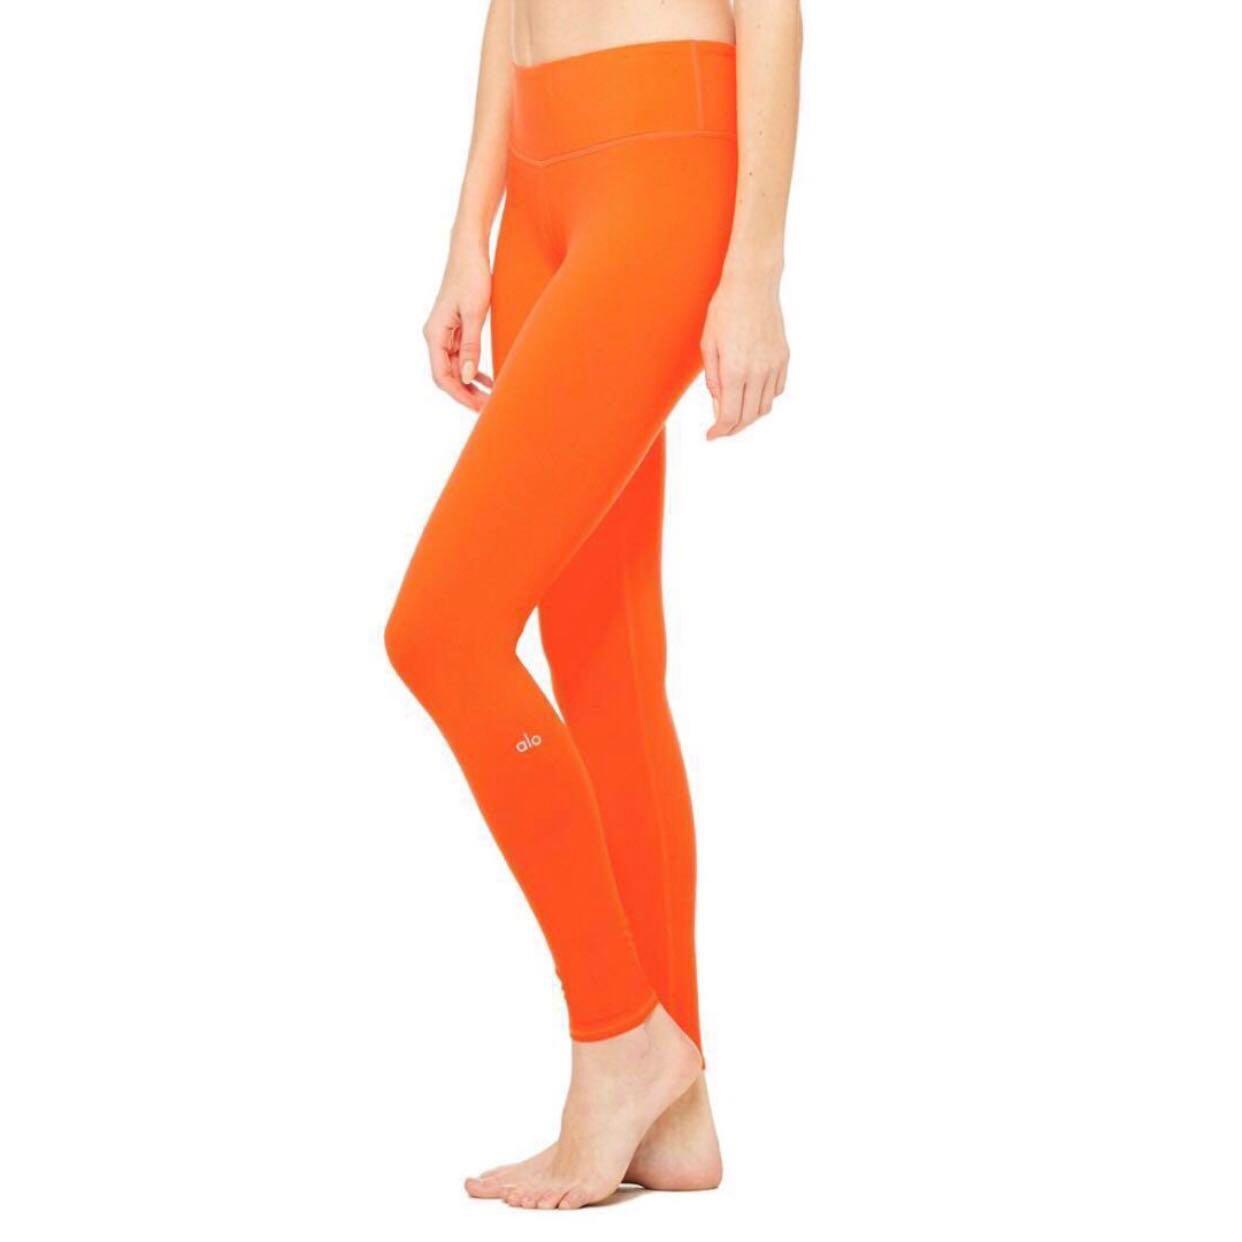 75d07d4d9b Alo Yoga Airbrush Legging - Neon Lily (glossy), Sports, Sports ...